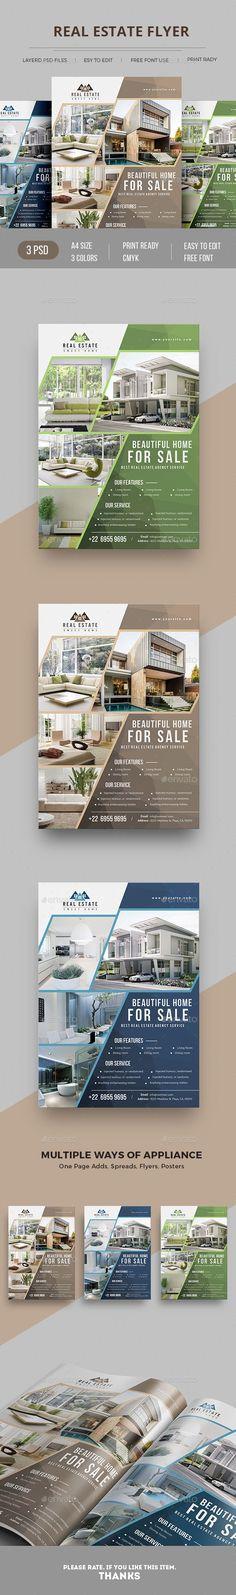 #Real Estate #Flyer - Commerce Flyers Download here: https://graphicriver.net/item/real-estate-flyer/19738534?ref=alena994